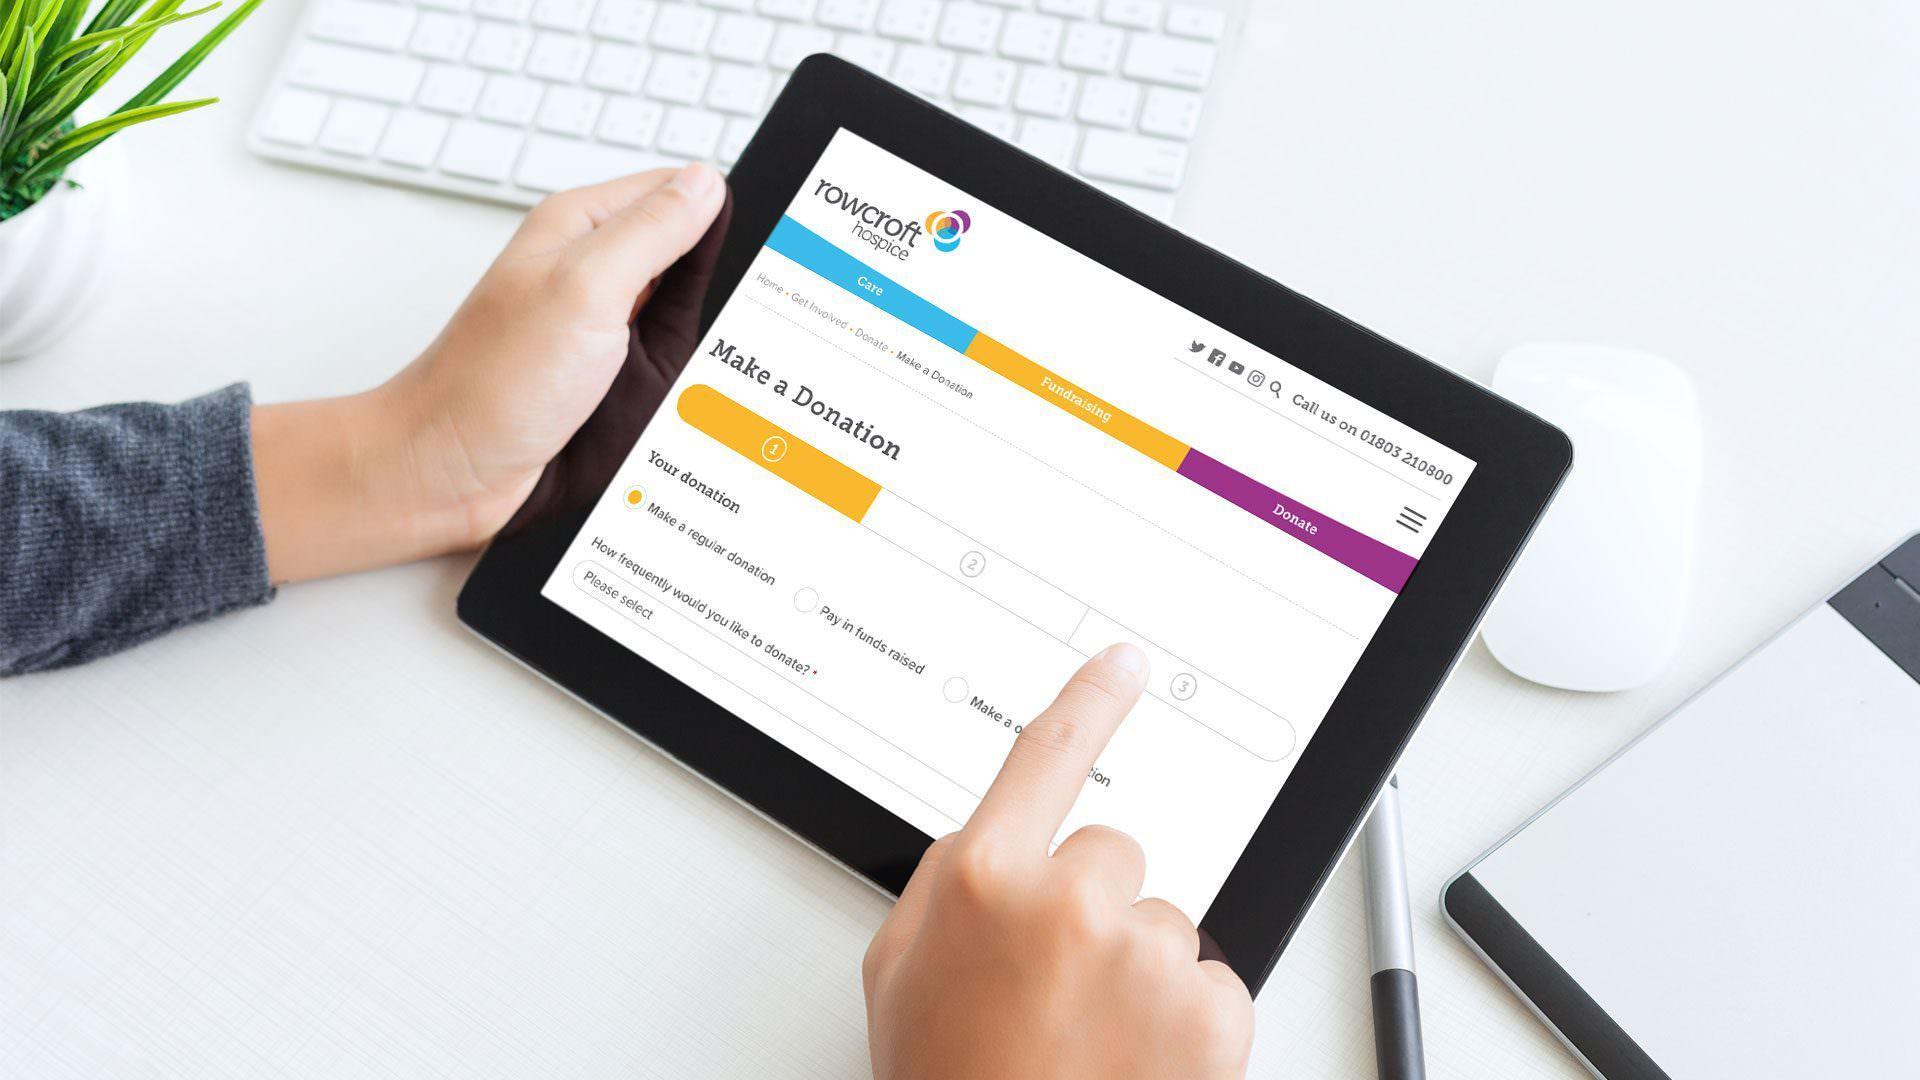 rowcroft website tablet